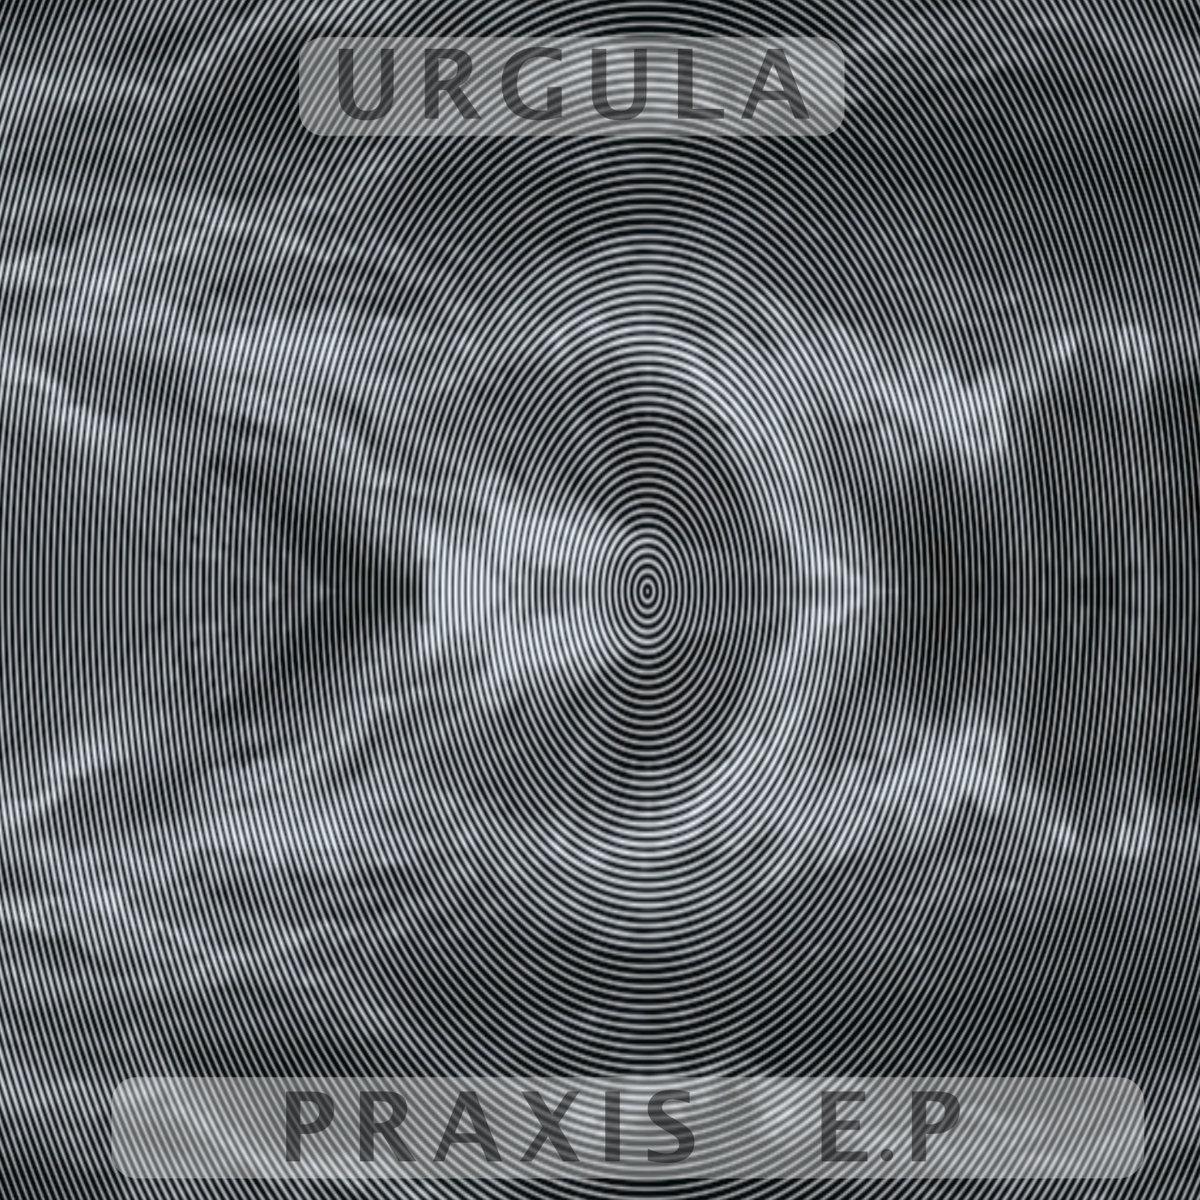 Urgula - Praxis E.P